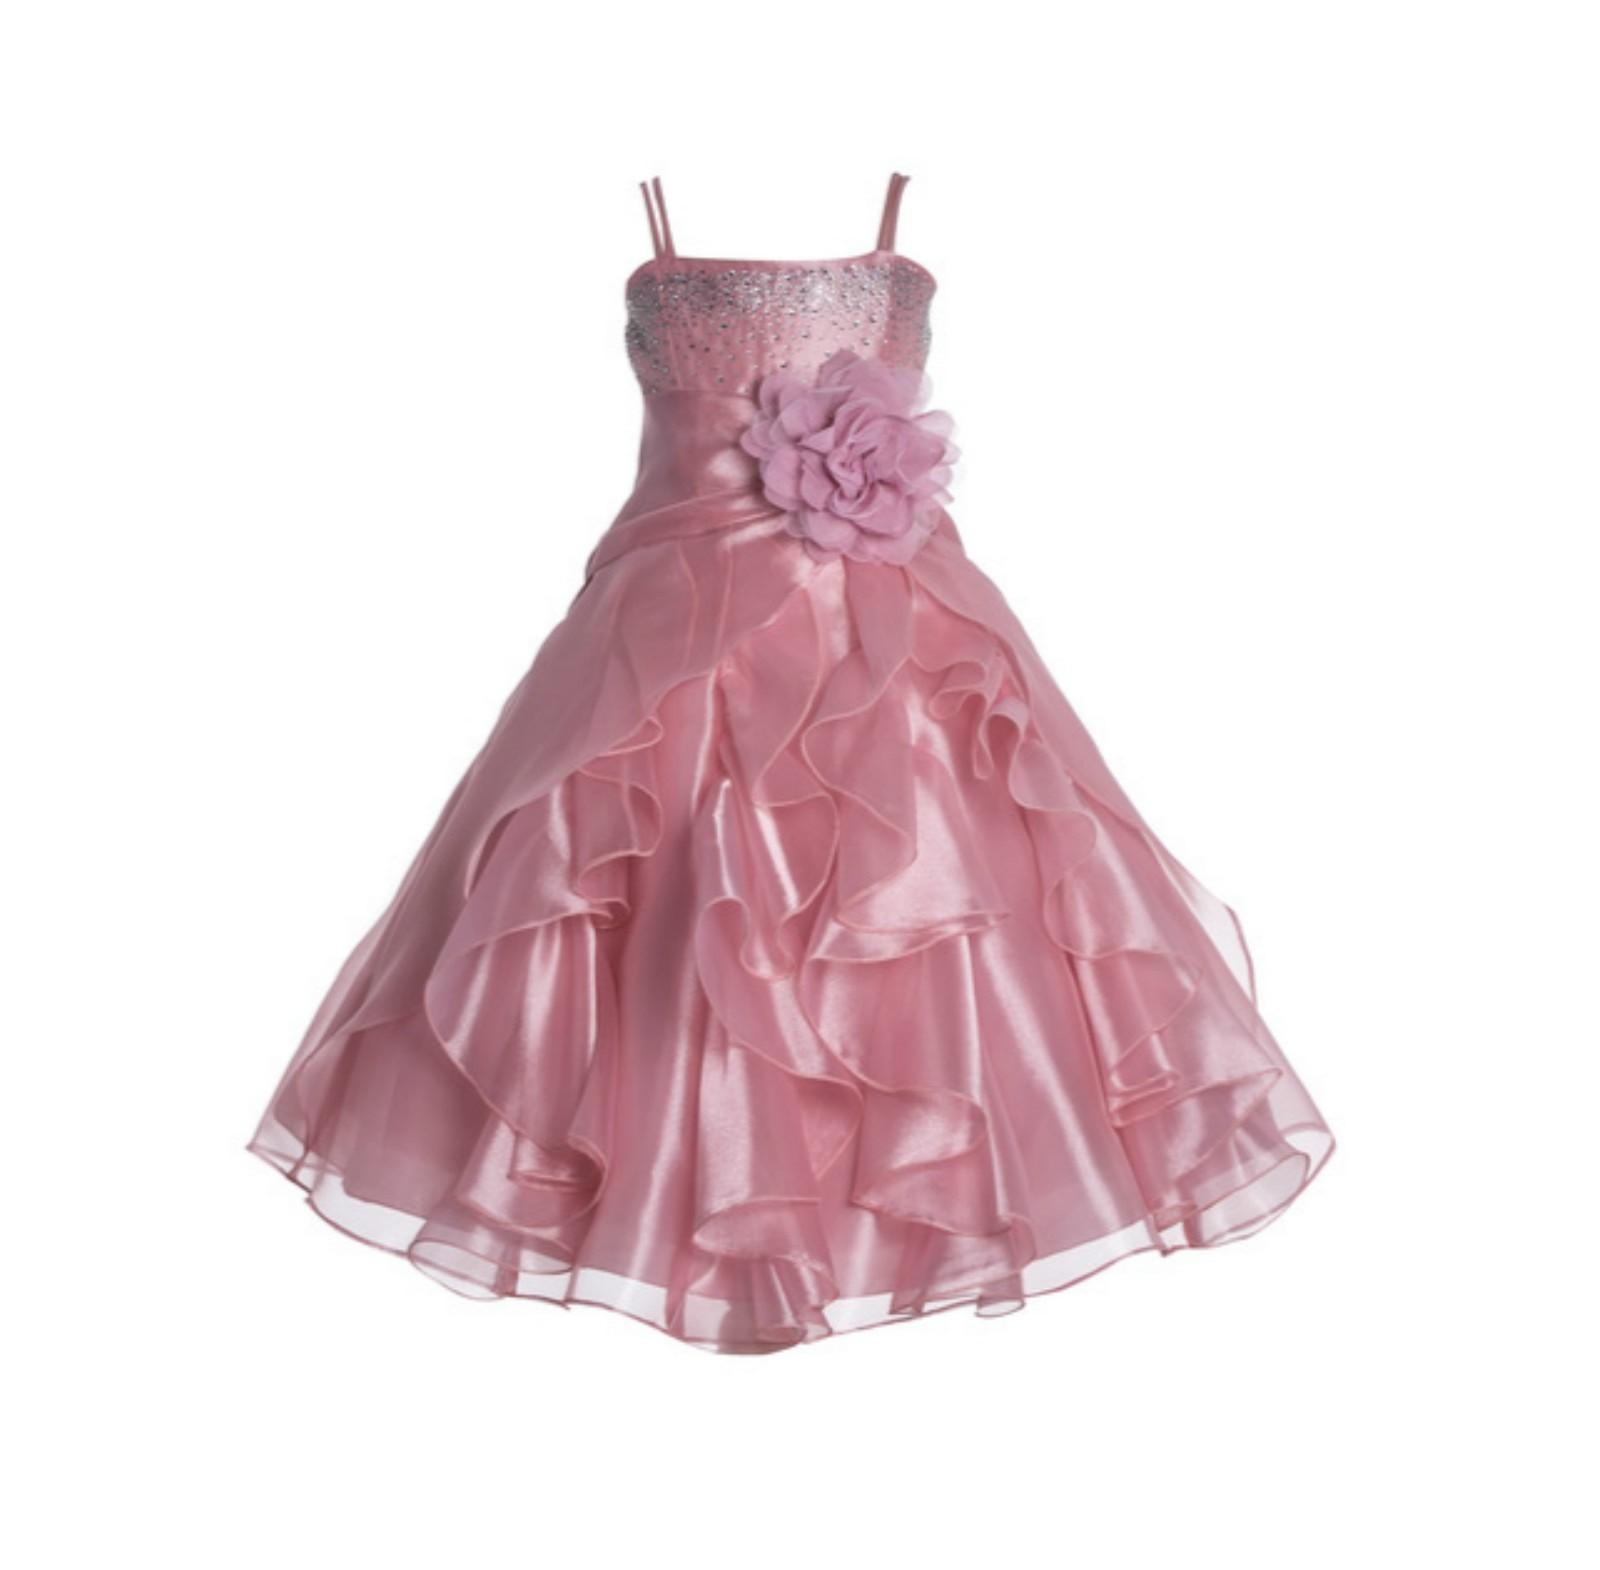 dffaa8a0f282 Dusty Rose Shimmering Organza Rhinestones Flower Girl Dress Formal ...